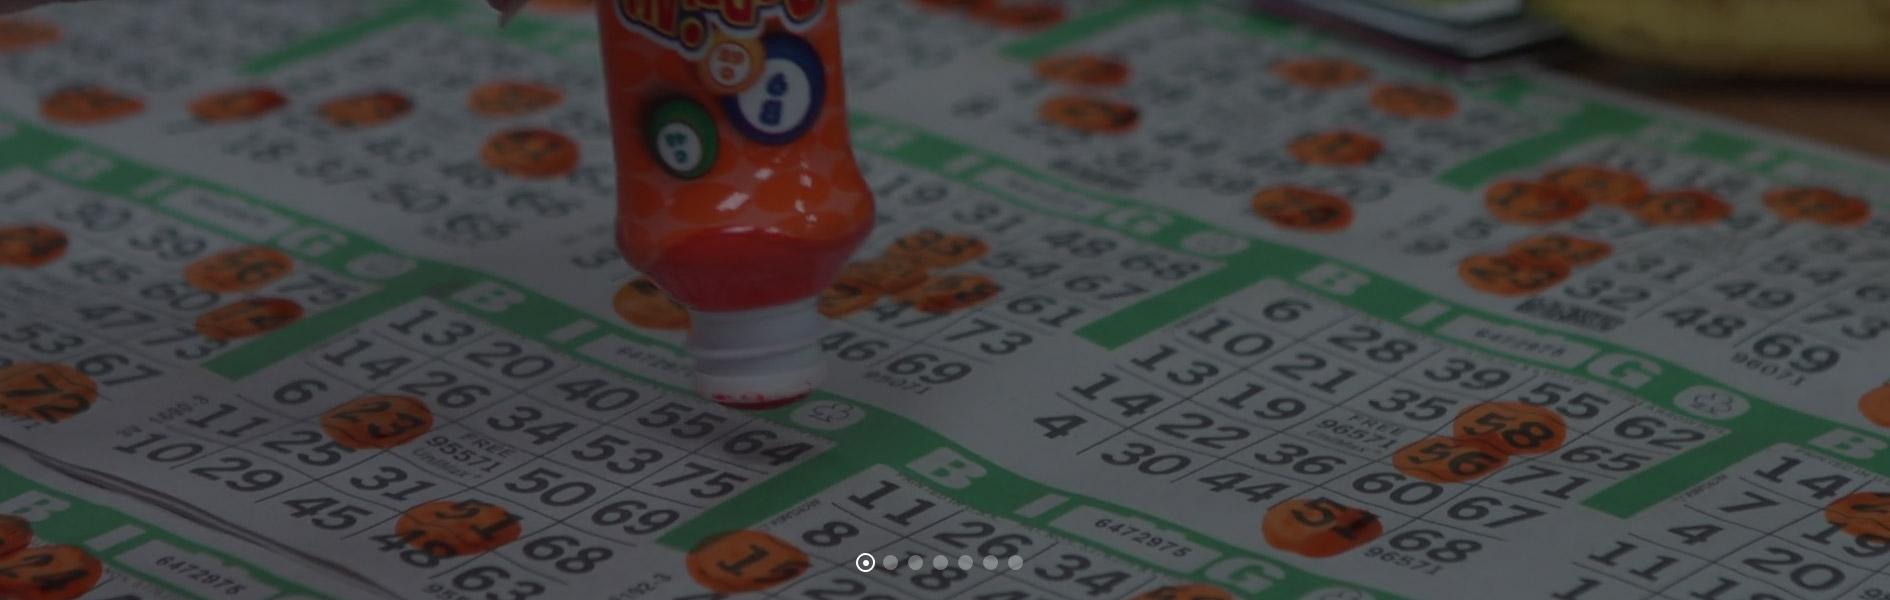 Bingo Dauber and Paper Background